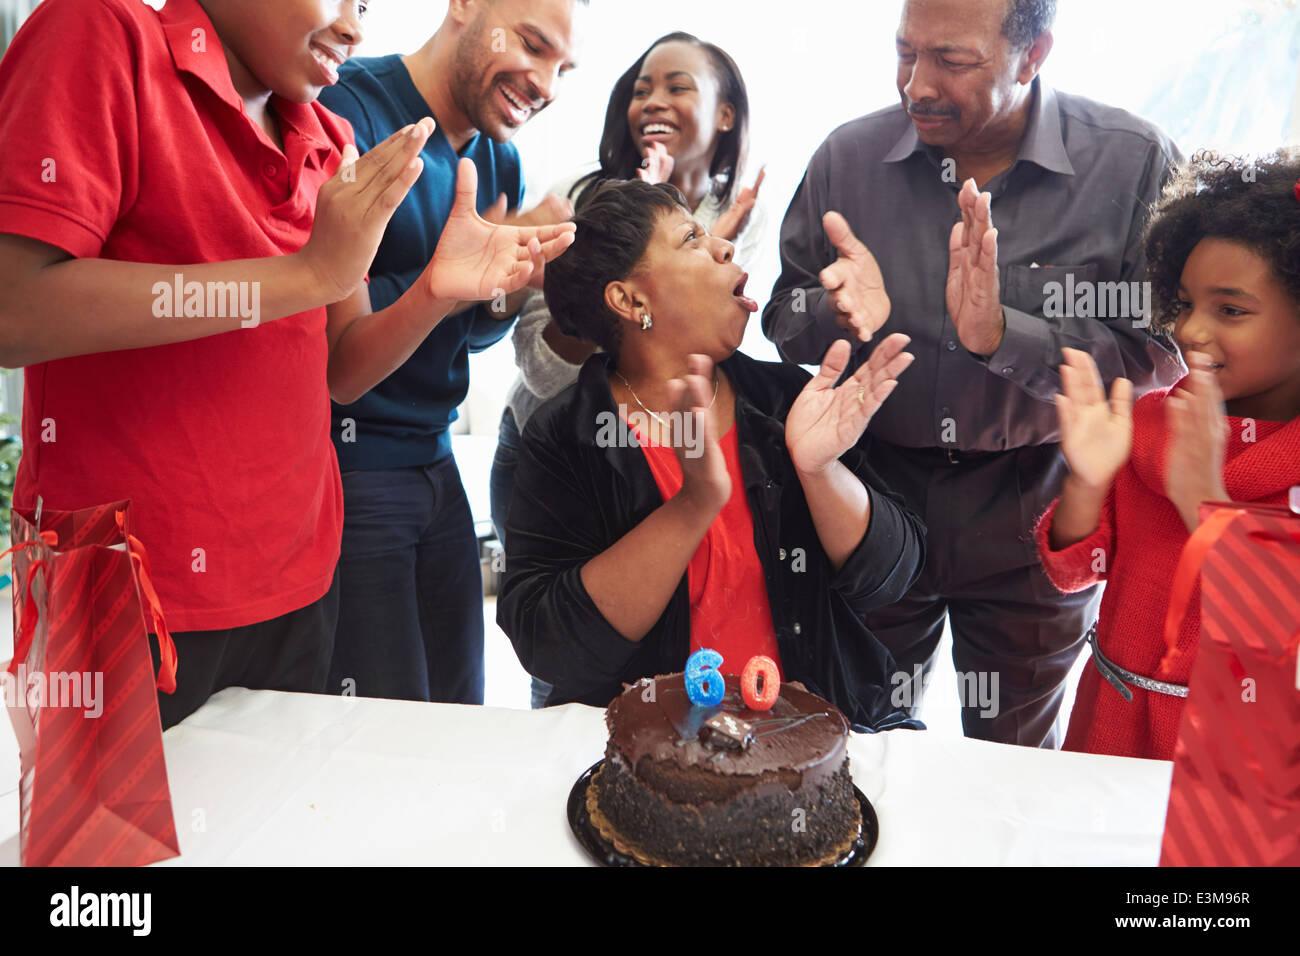 familie feiern 60 geburtstag stockfoto bild 71131727 alamy. Black Bedroom Furniture Sets. Home Design Ideas